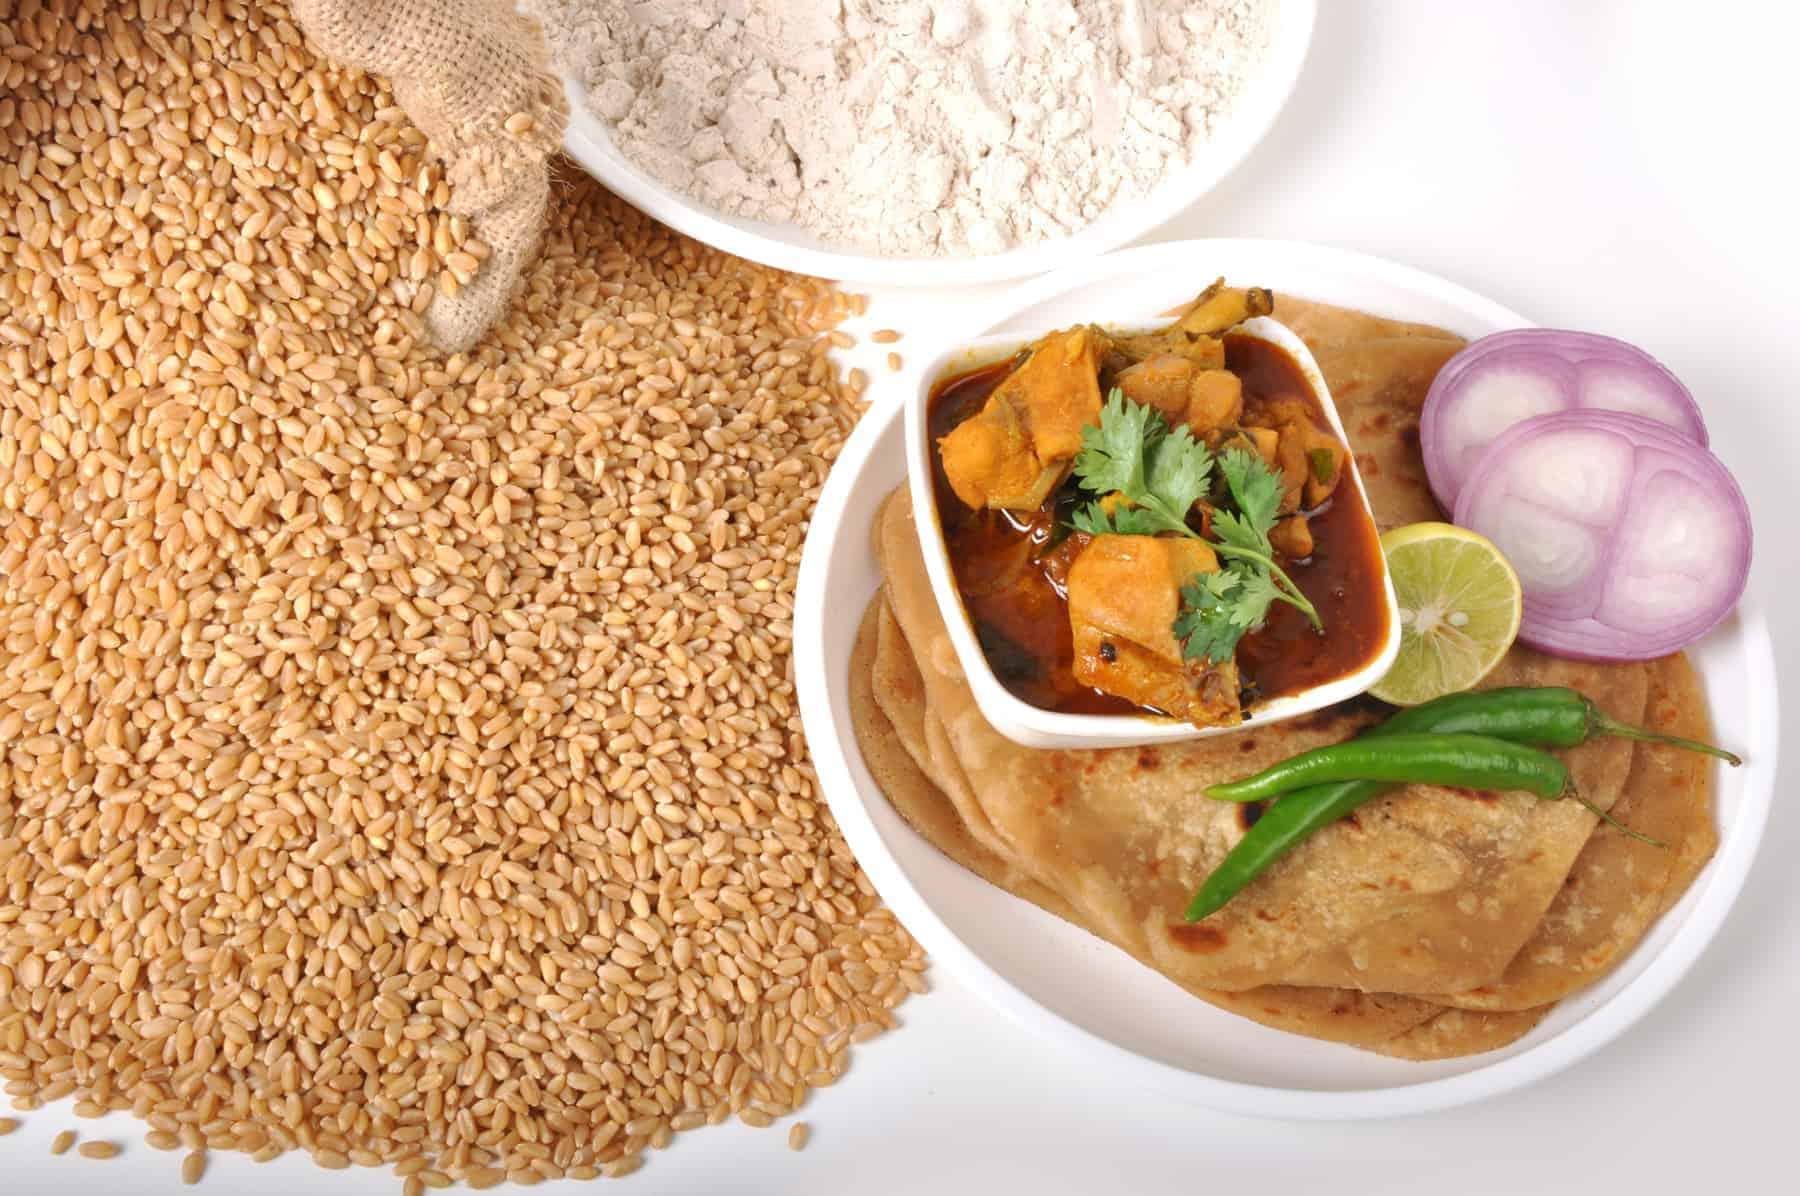 Wheat food - chapati & chicken